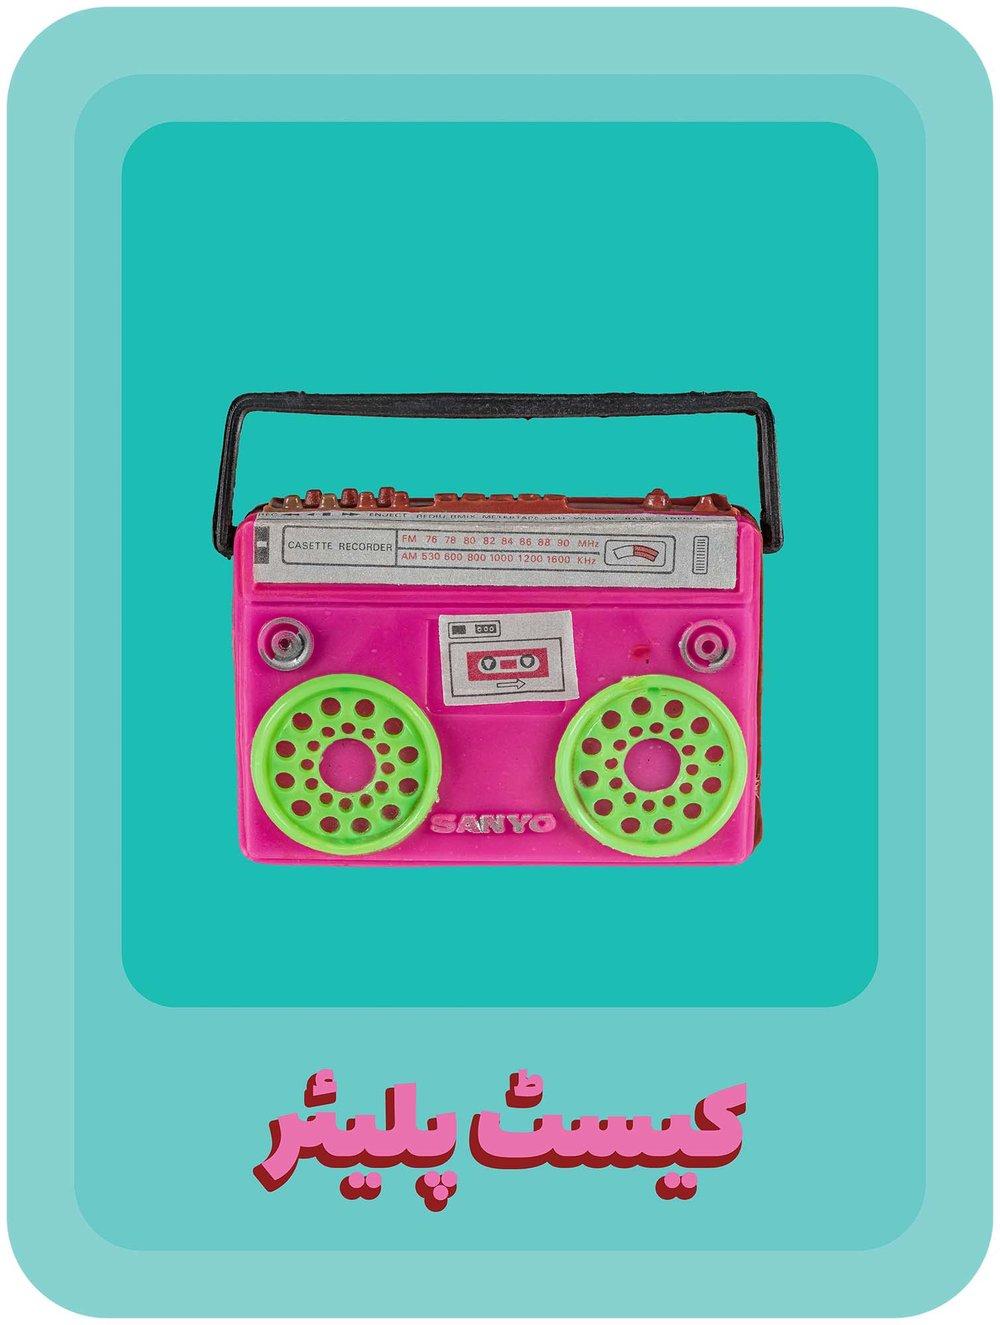 Cassette Player #1